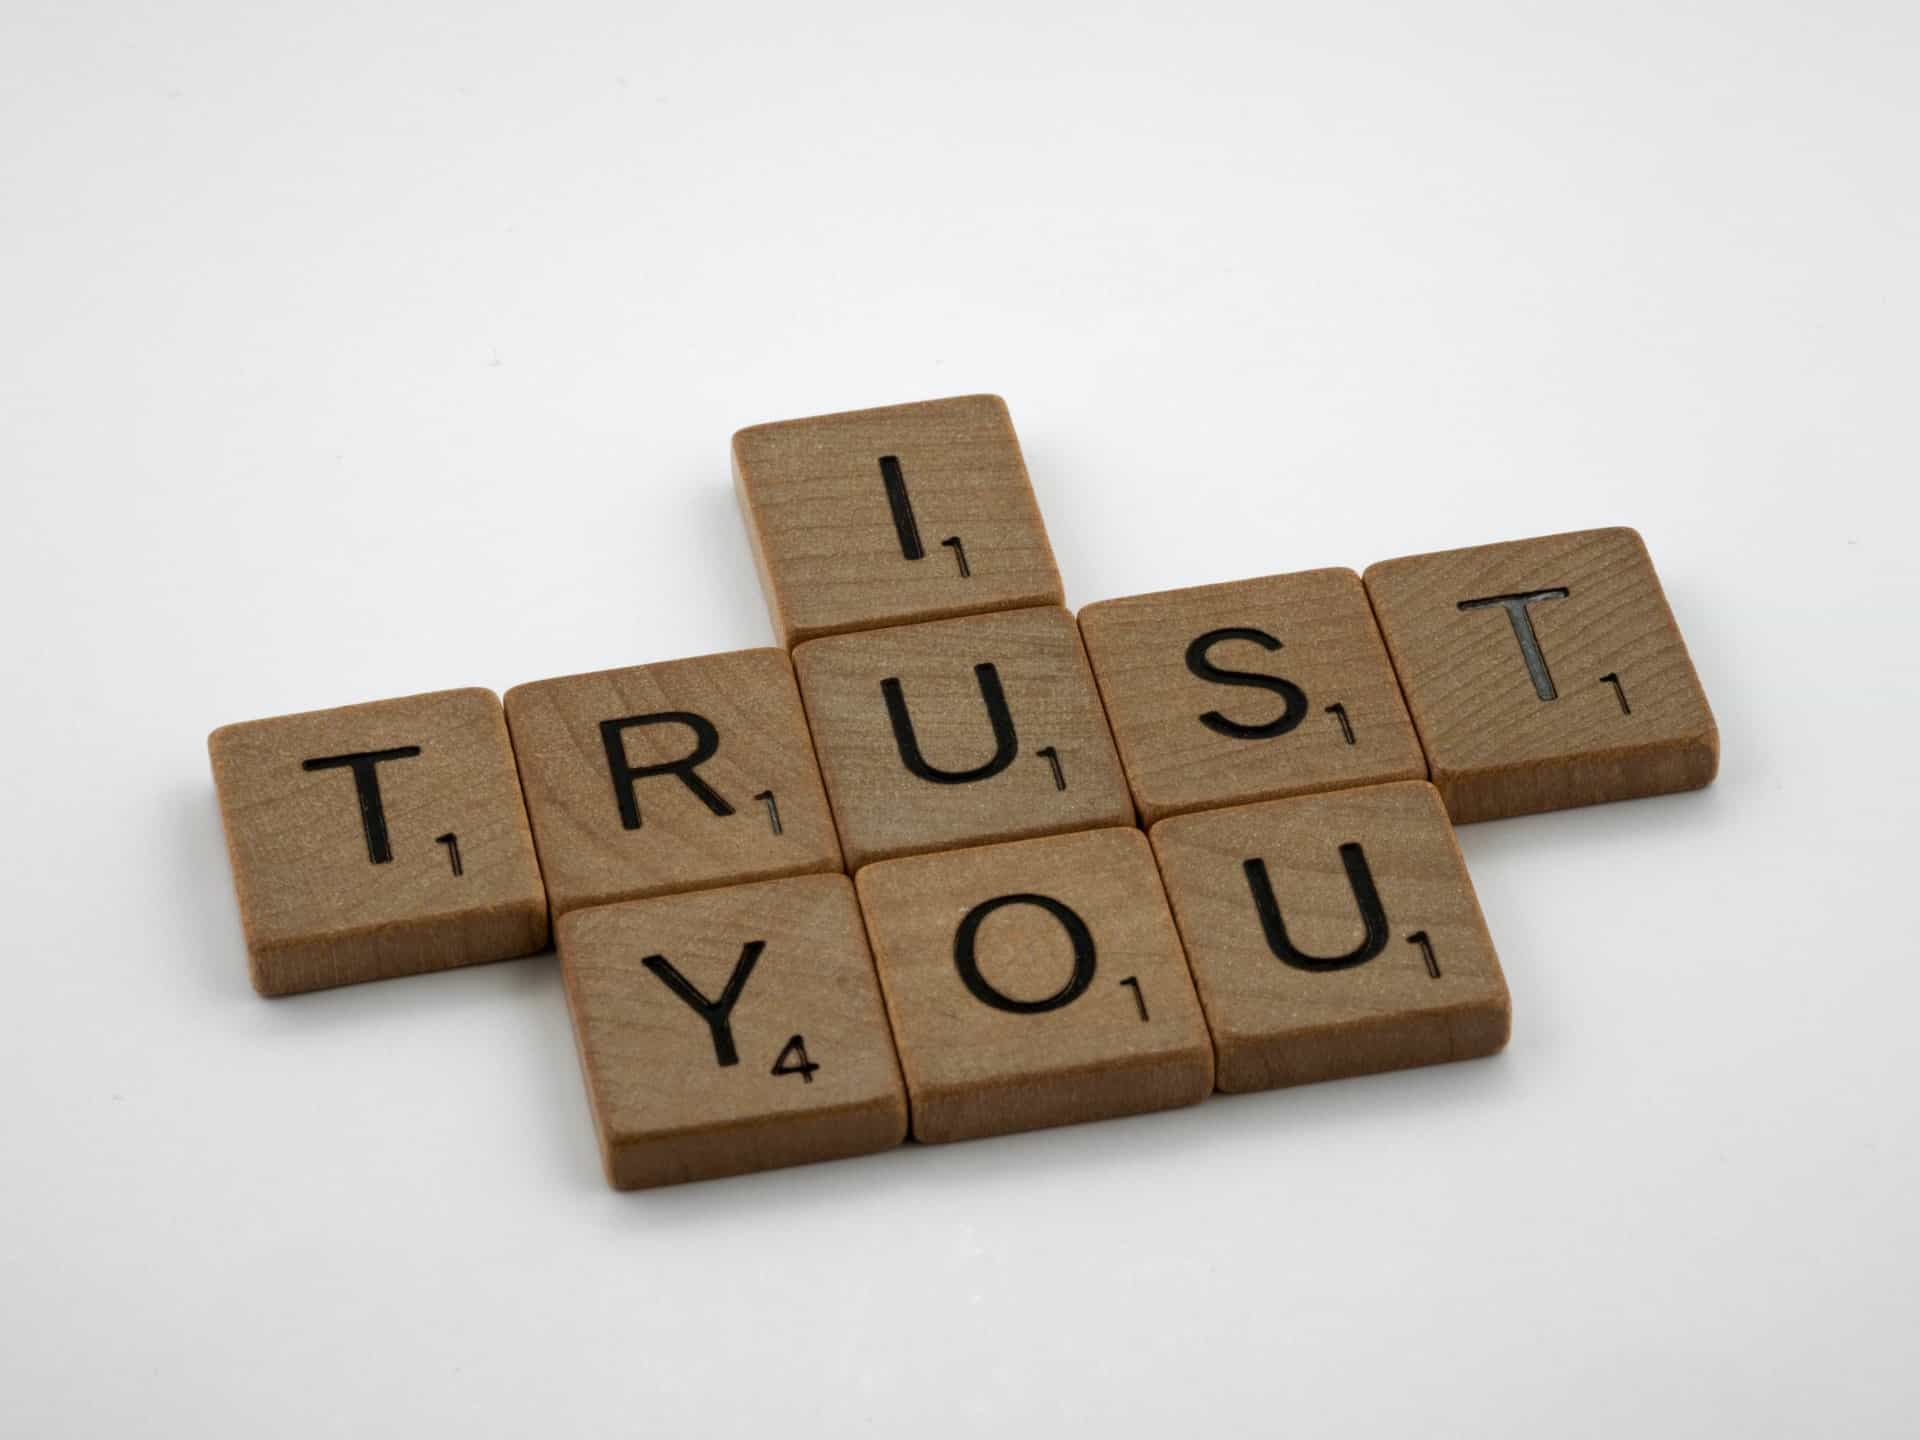 I trust you blocks